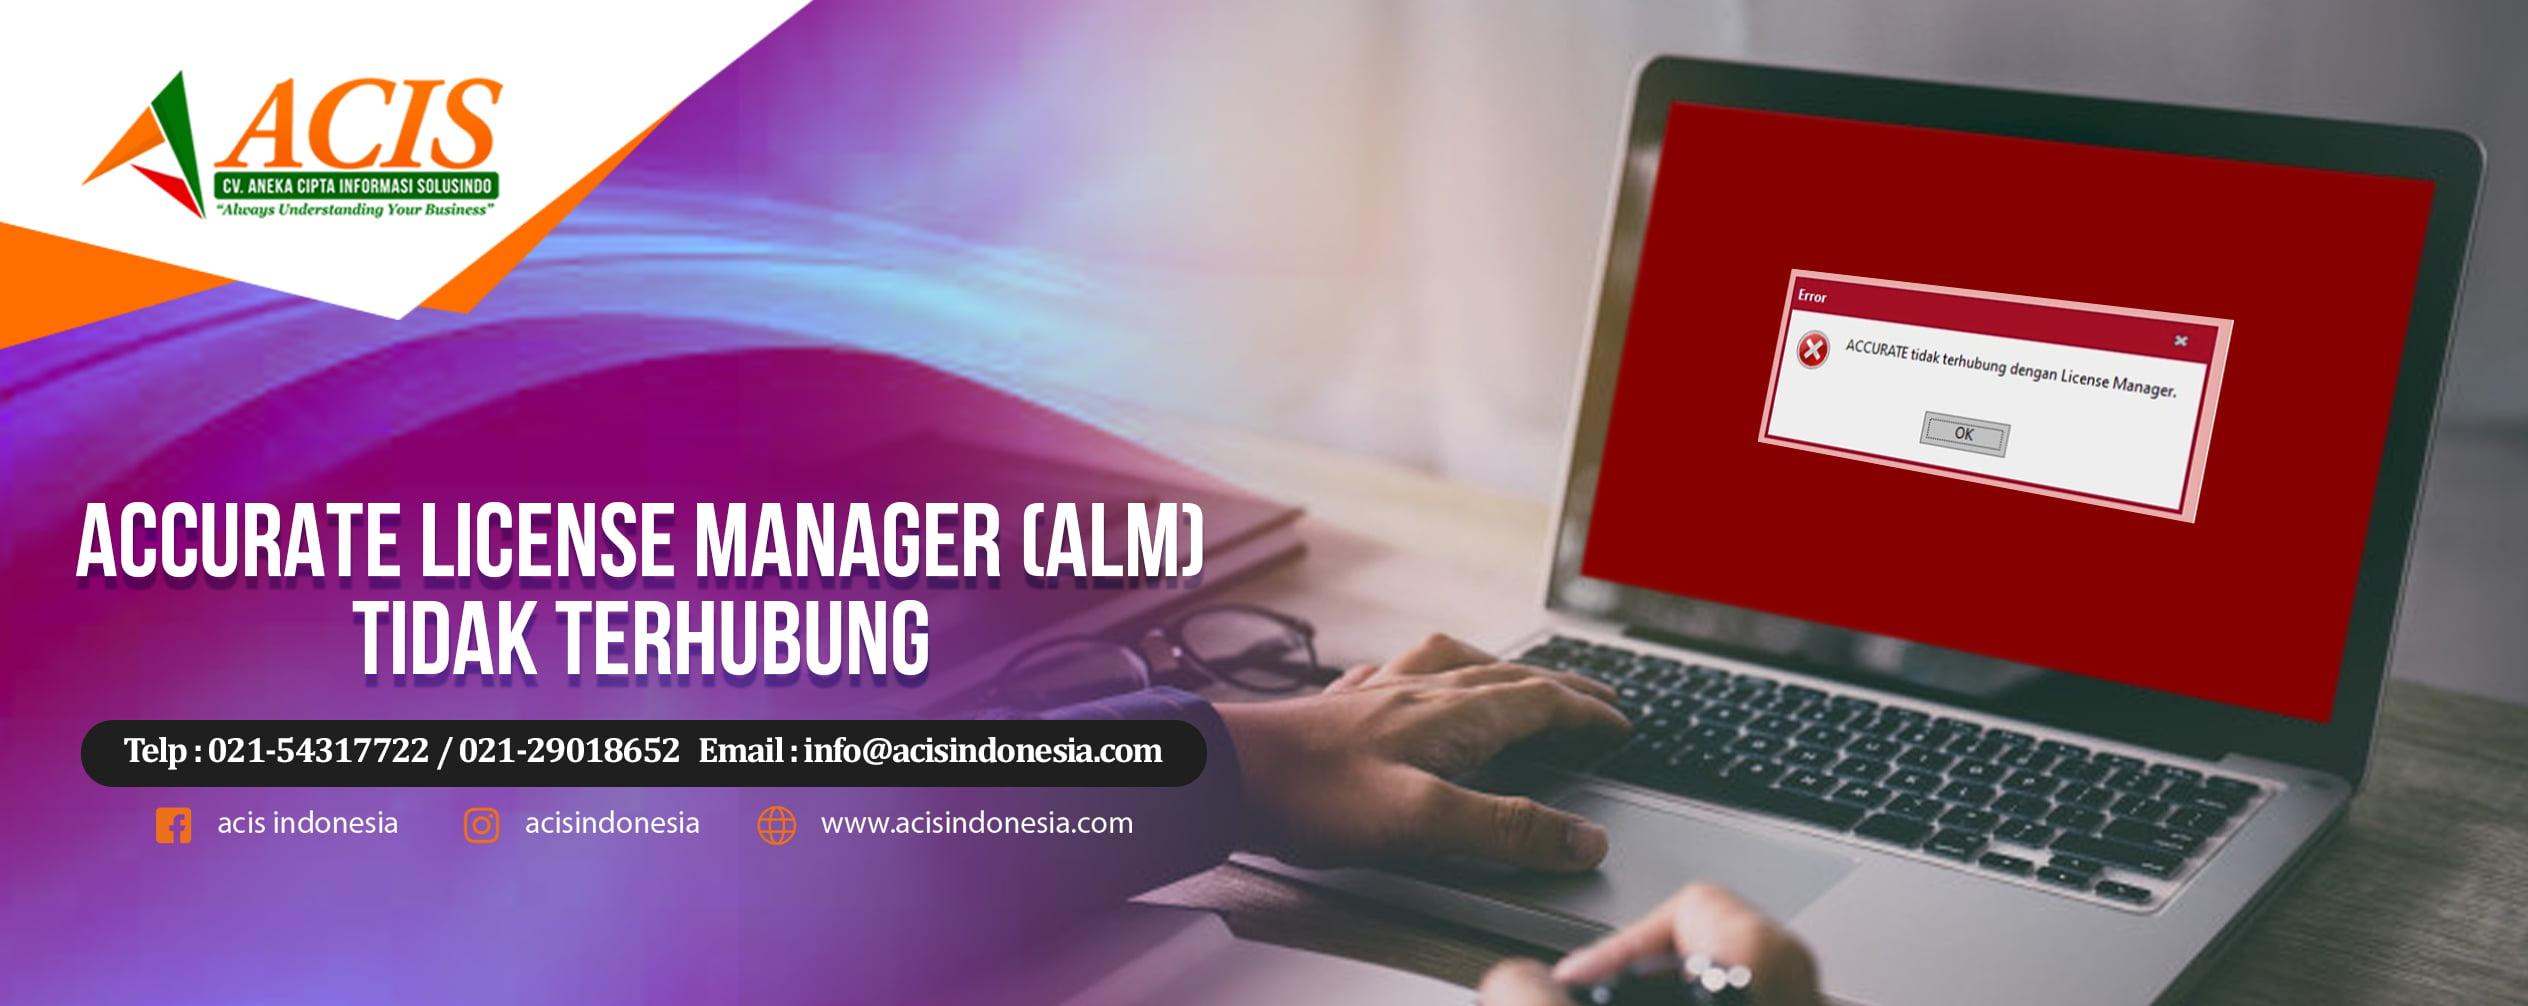 Accurate License Manager (ALM) Tidak Terhubung